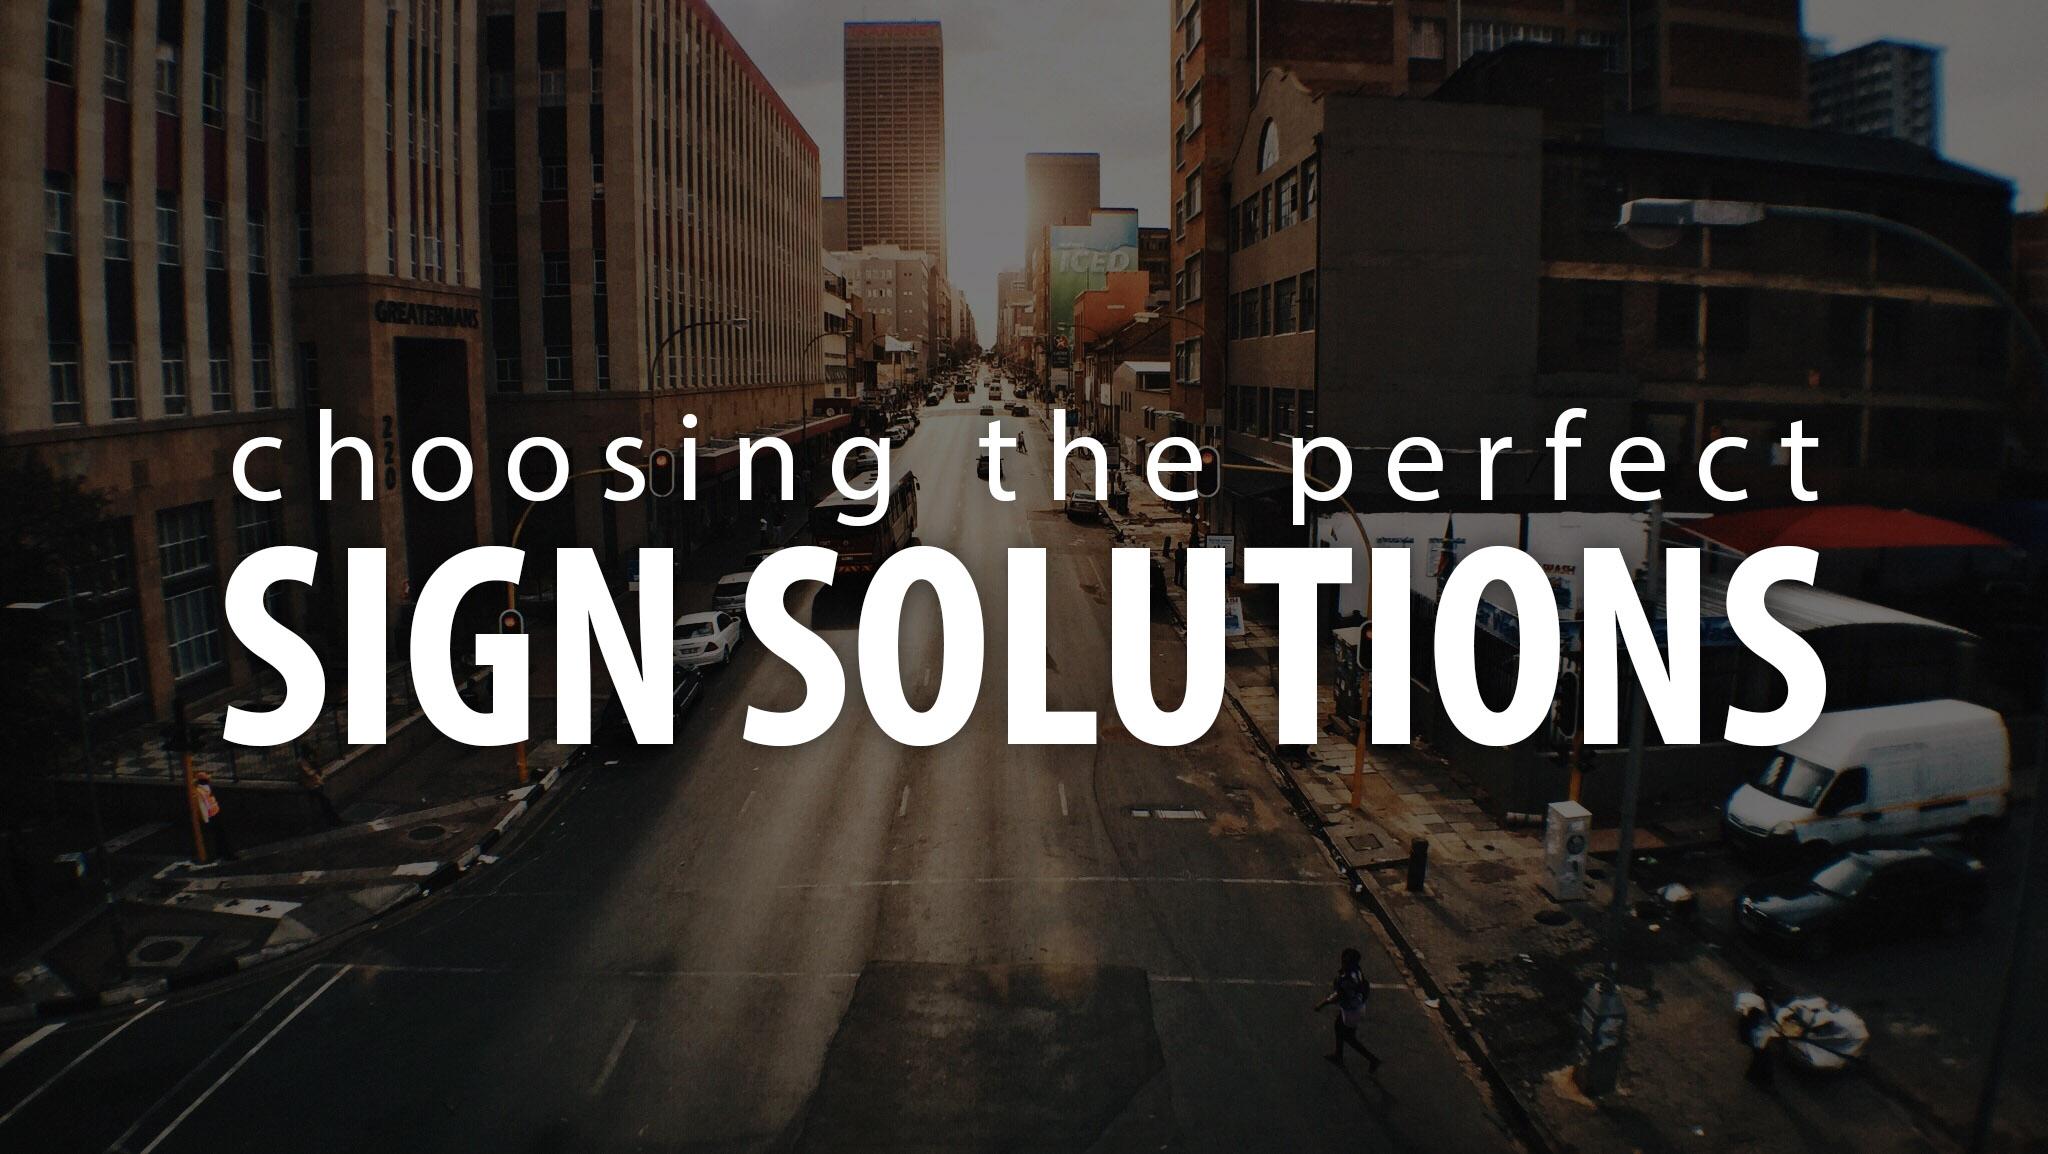 sign-solutions.jpg